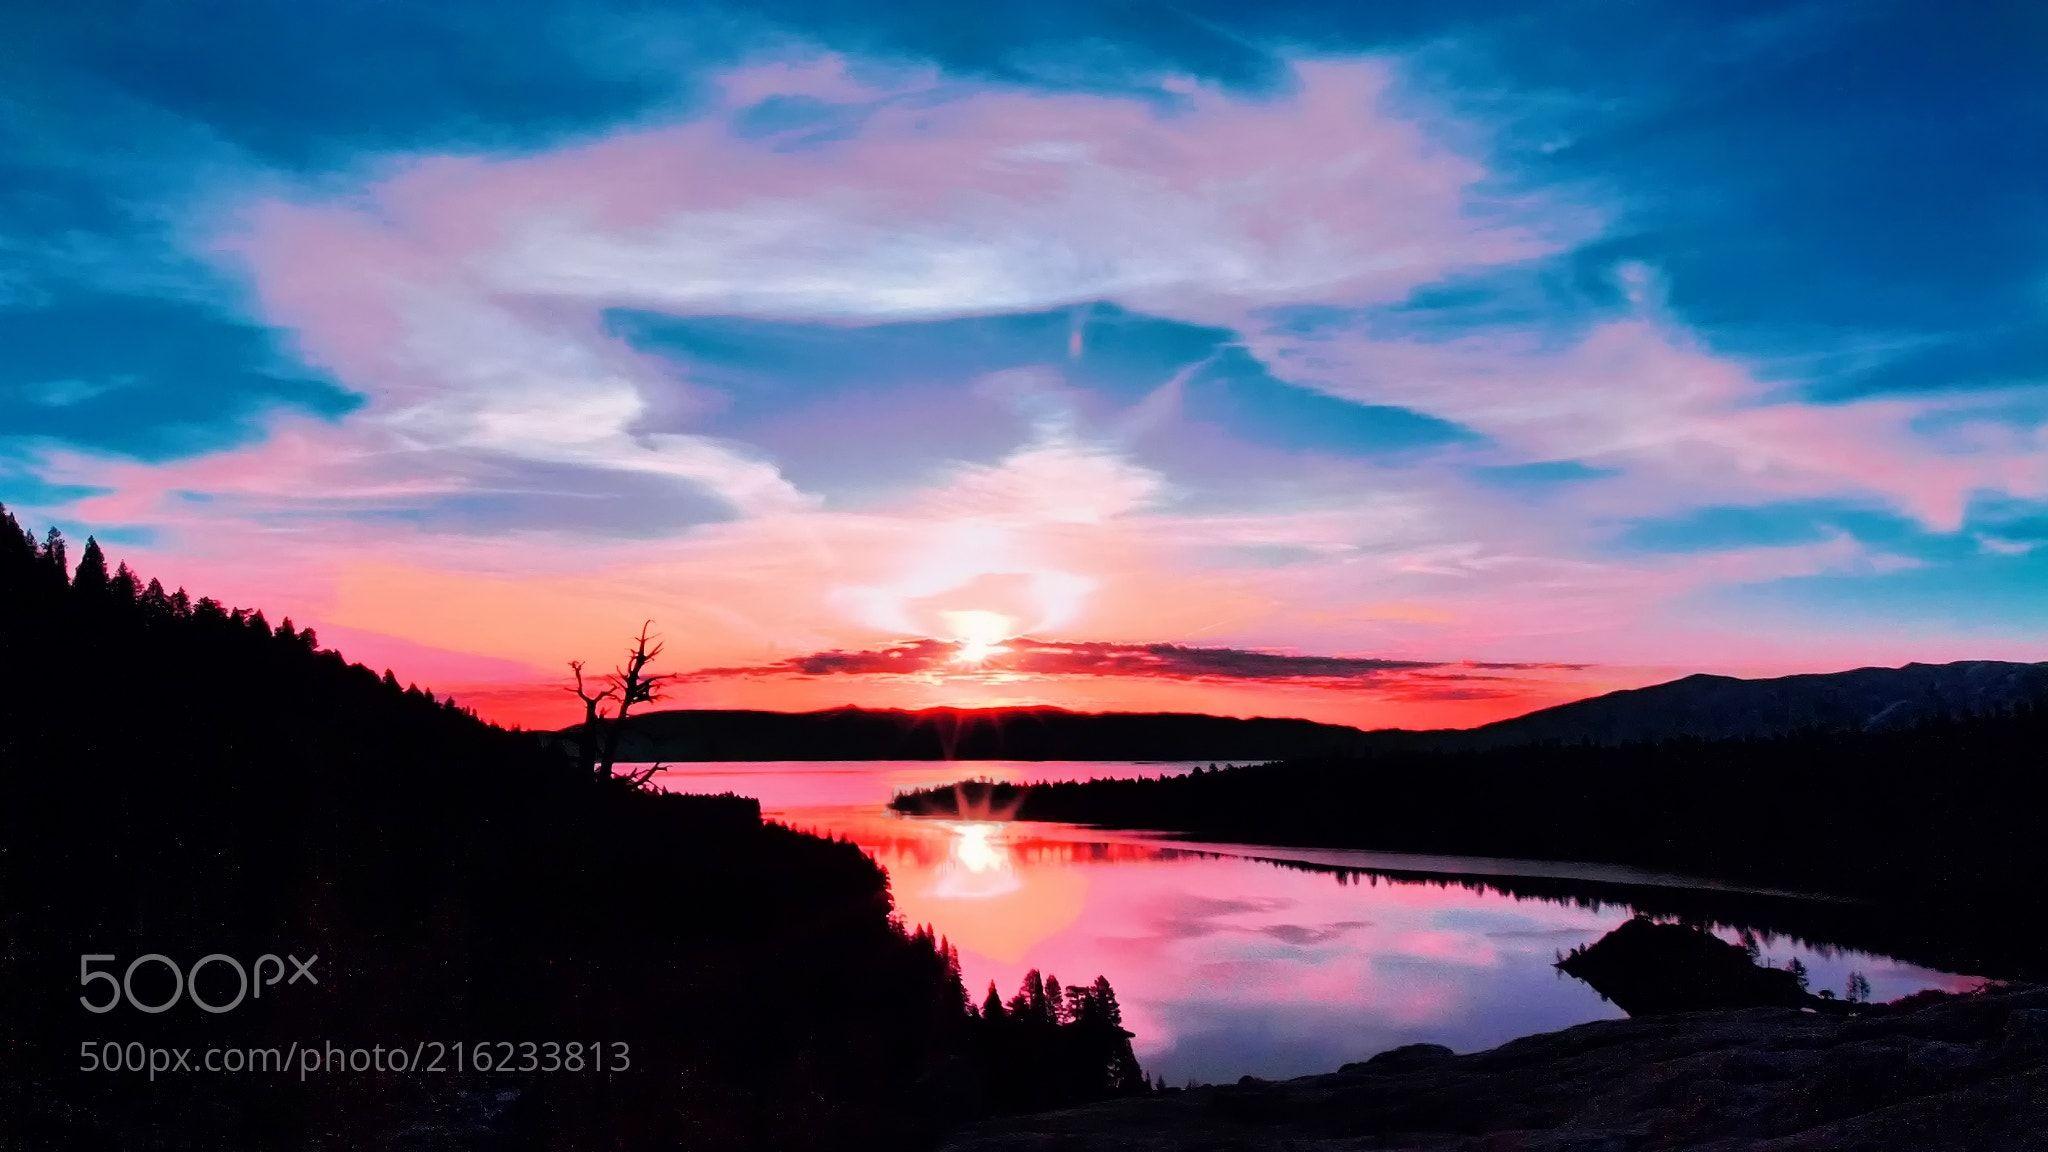 Lake tahoe sunset travel channel pinterest - Tahoe Sunrise Ed Puskas Redondo Beach Usa Nikon D200 Landscape